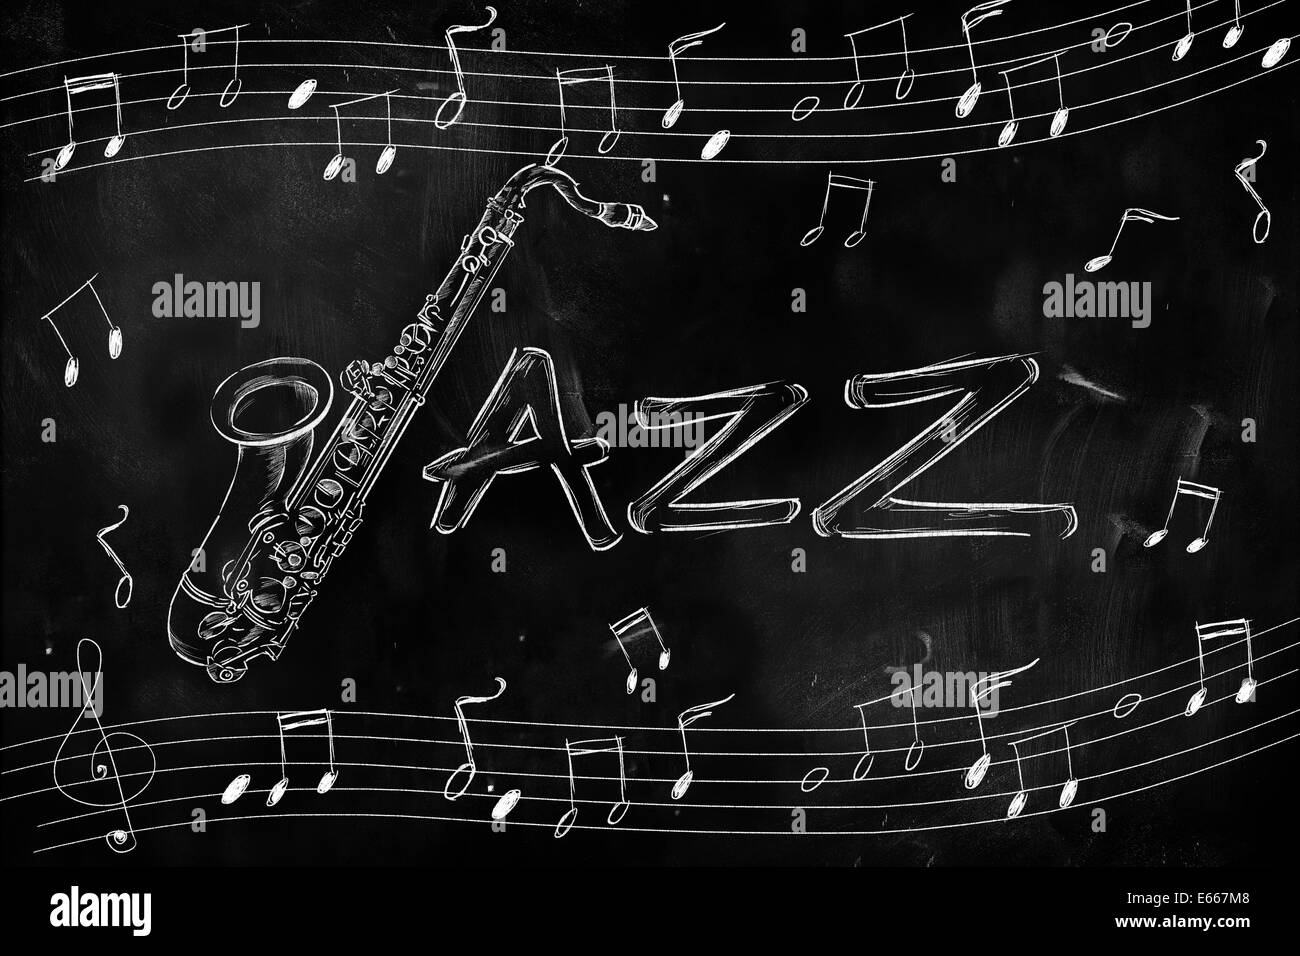 Jazz Saxophone Drawing On Blackboard Music Wallpaper